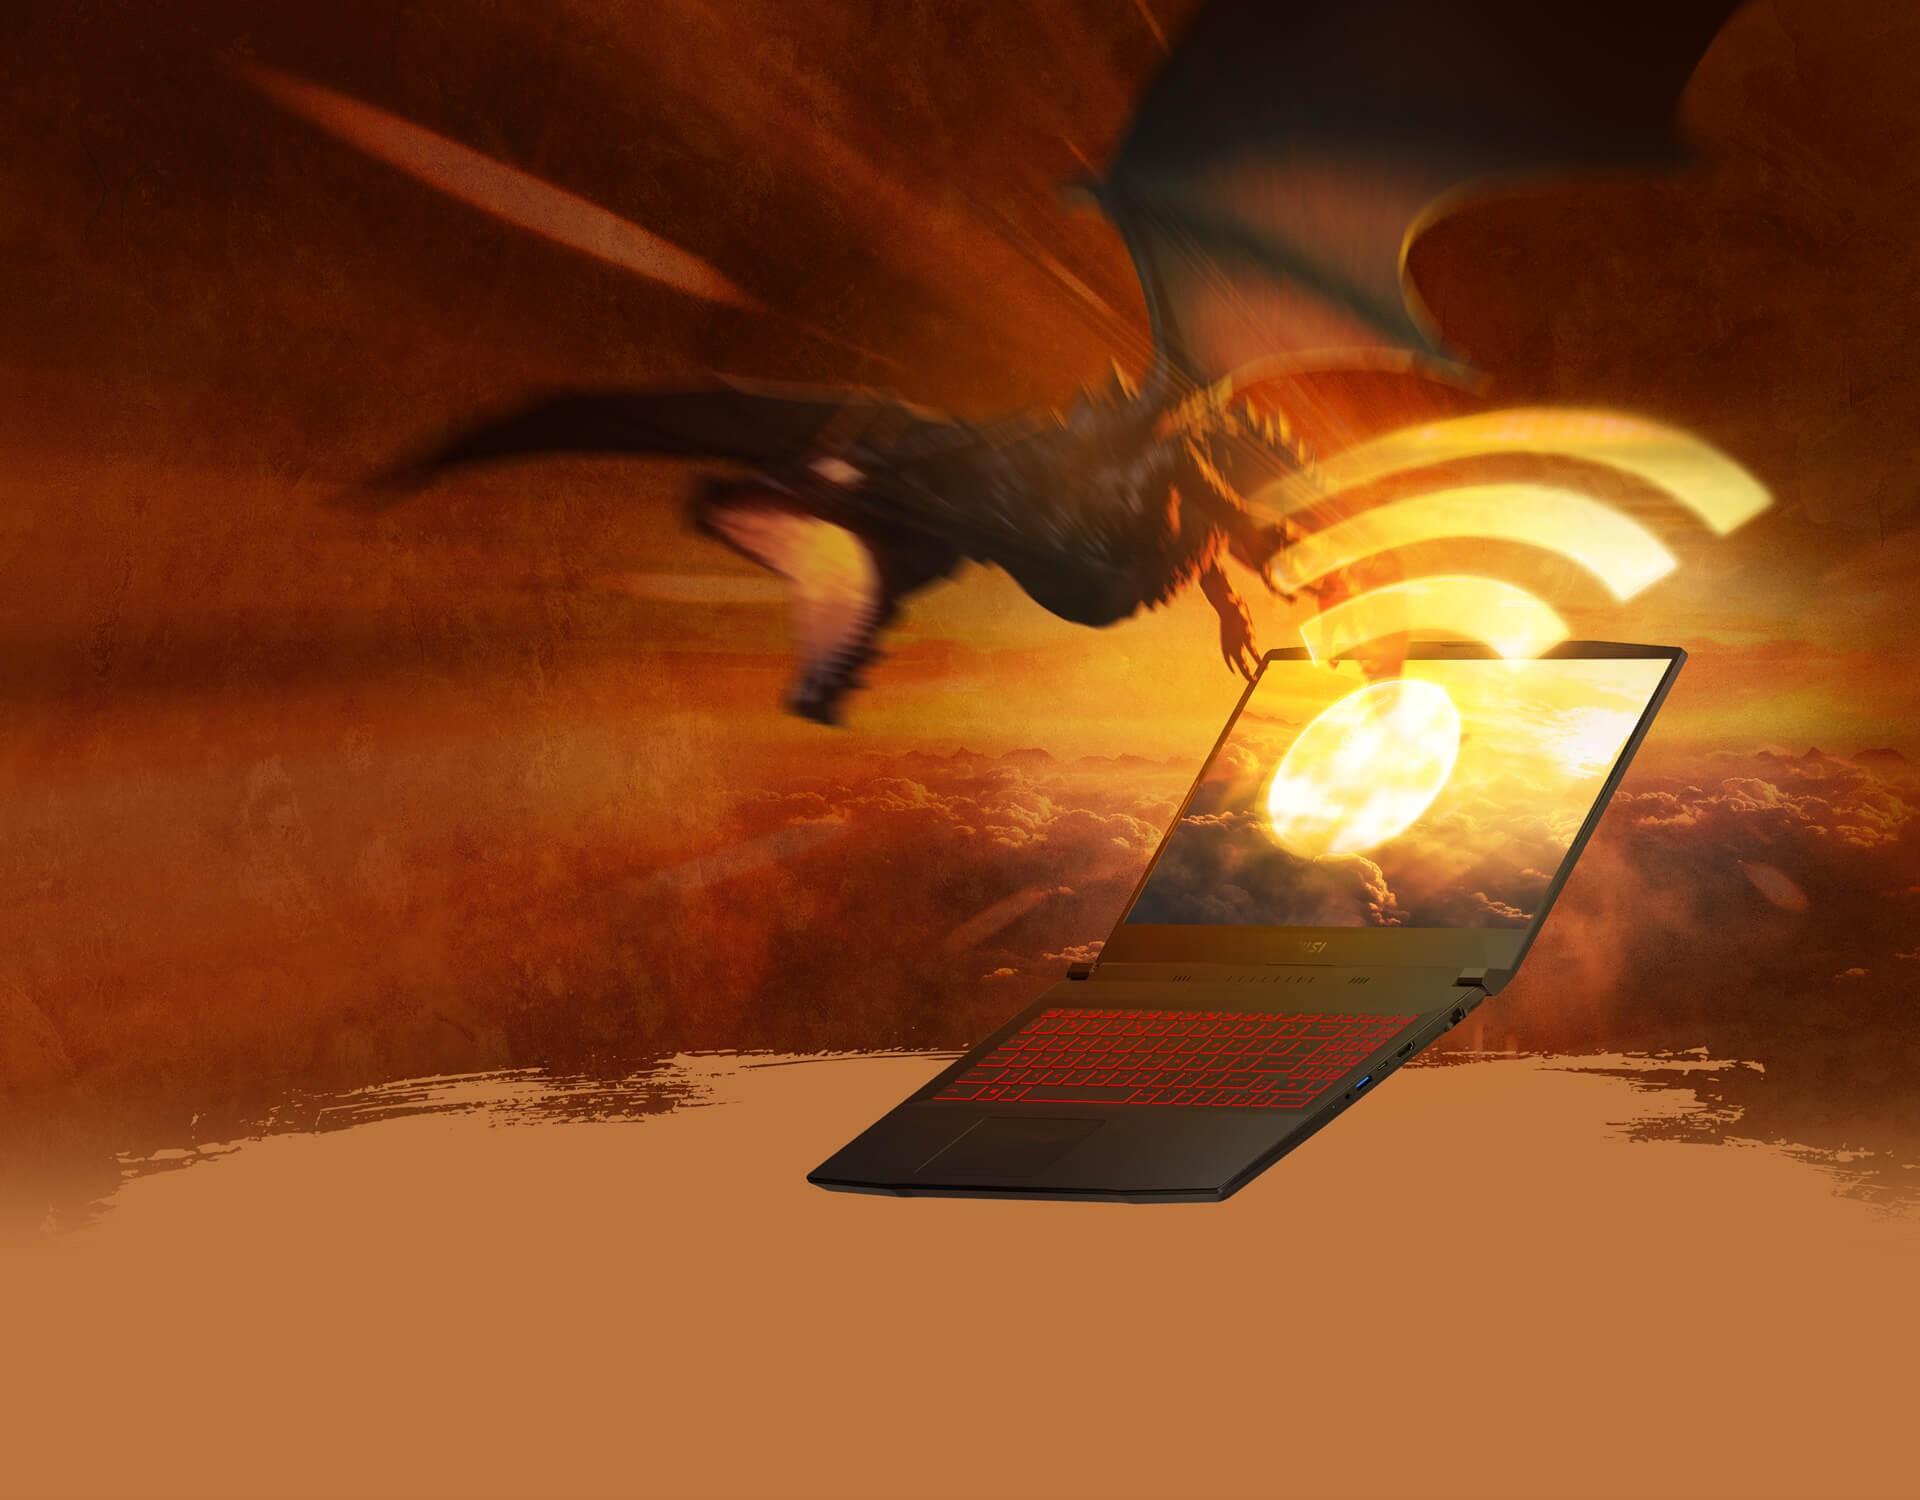 MSI GF66 11UC-084CA Katana w/ Core™ i5-11400H, 8GB, 512GB NVMe SSD, 15.6in FHD 144Hz, GeForce RTX 3050, Wi-Fi 6, Win 10 Home - Laptops / Notebooks - Memory Express Inc.